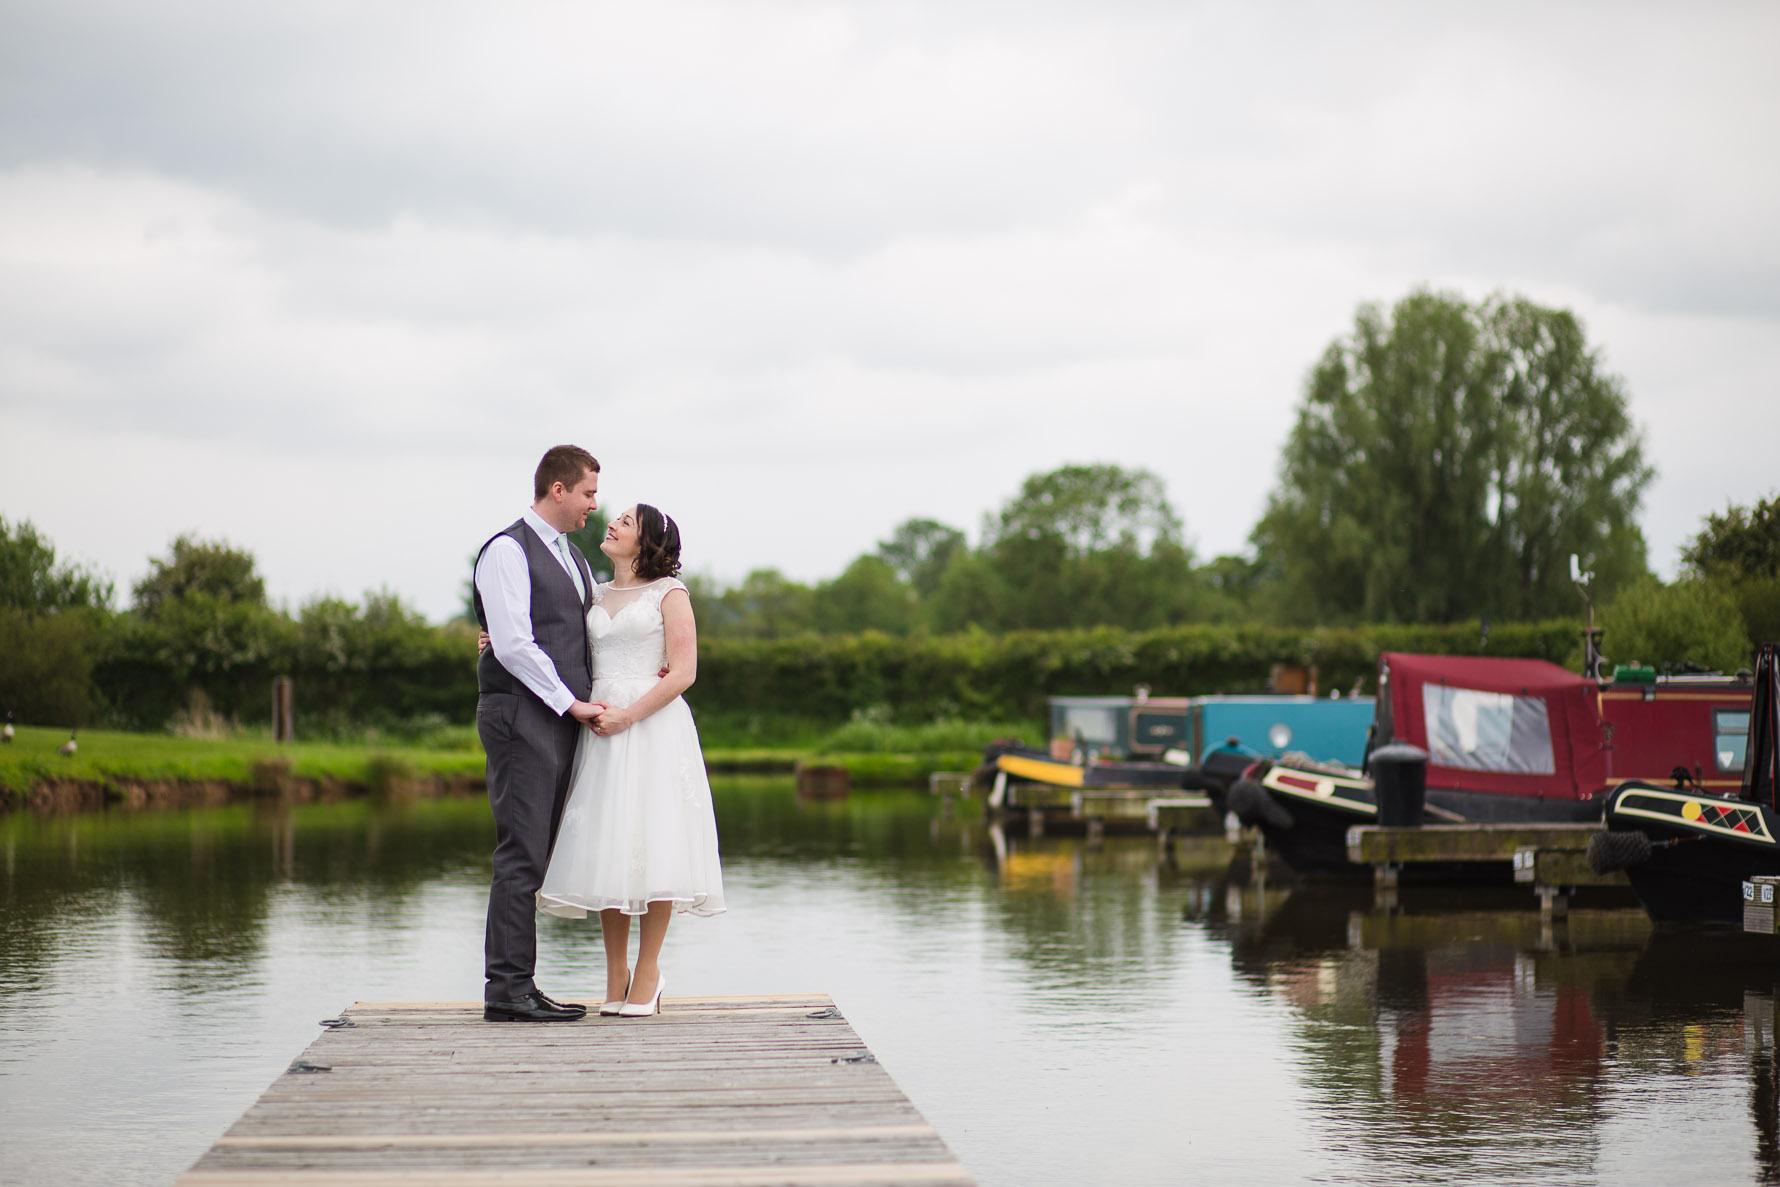 Aston Marina Wedding Photography Helen Howard-1.jpg